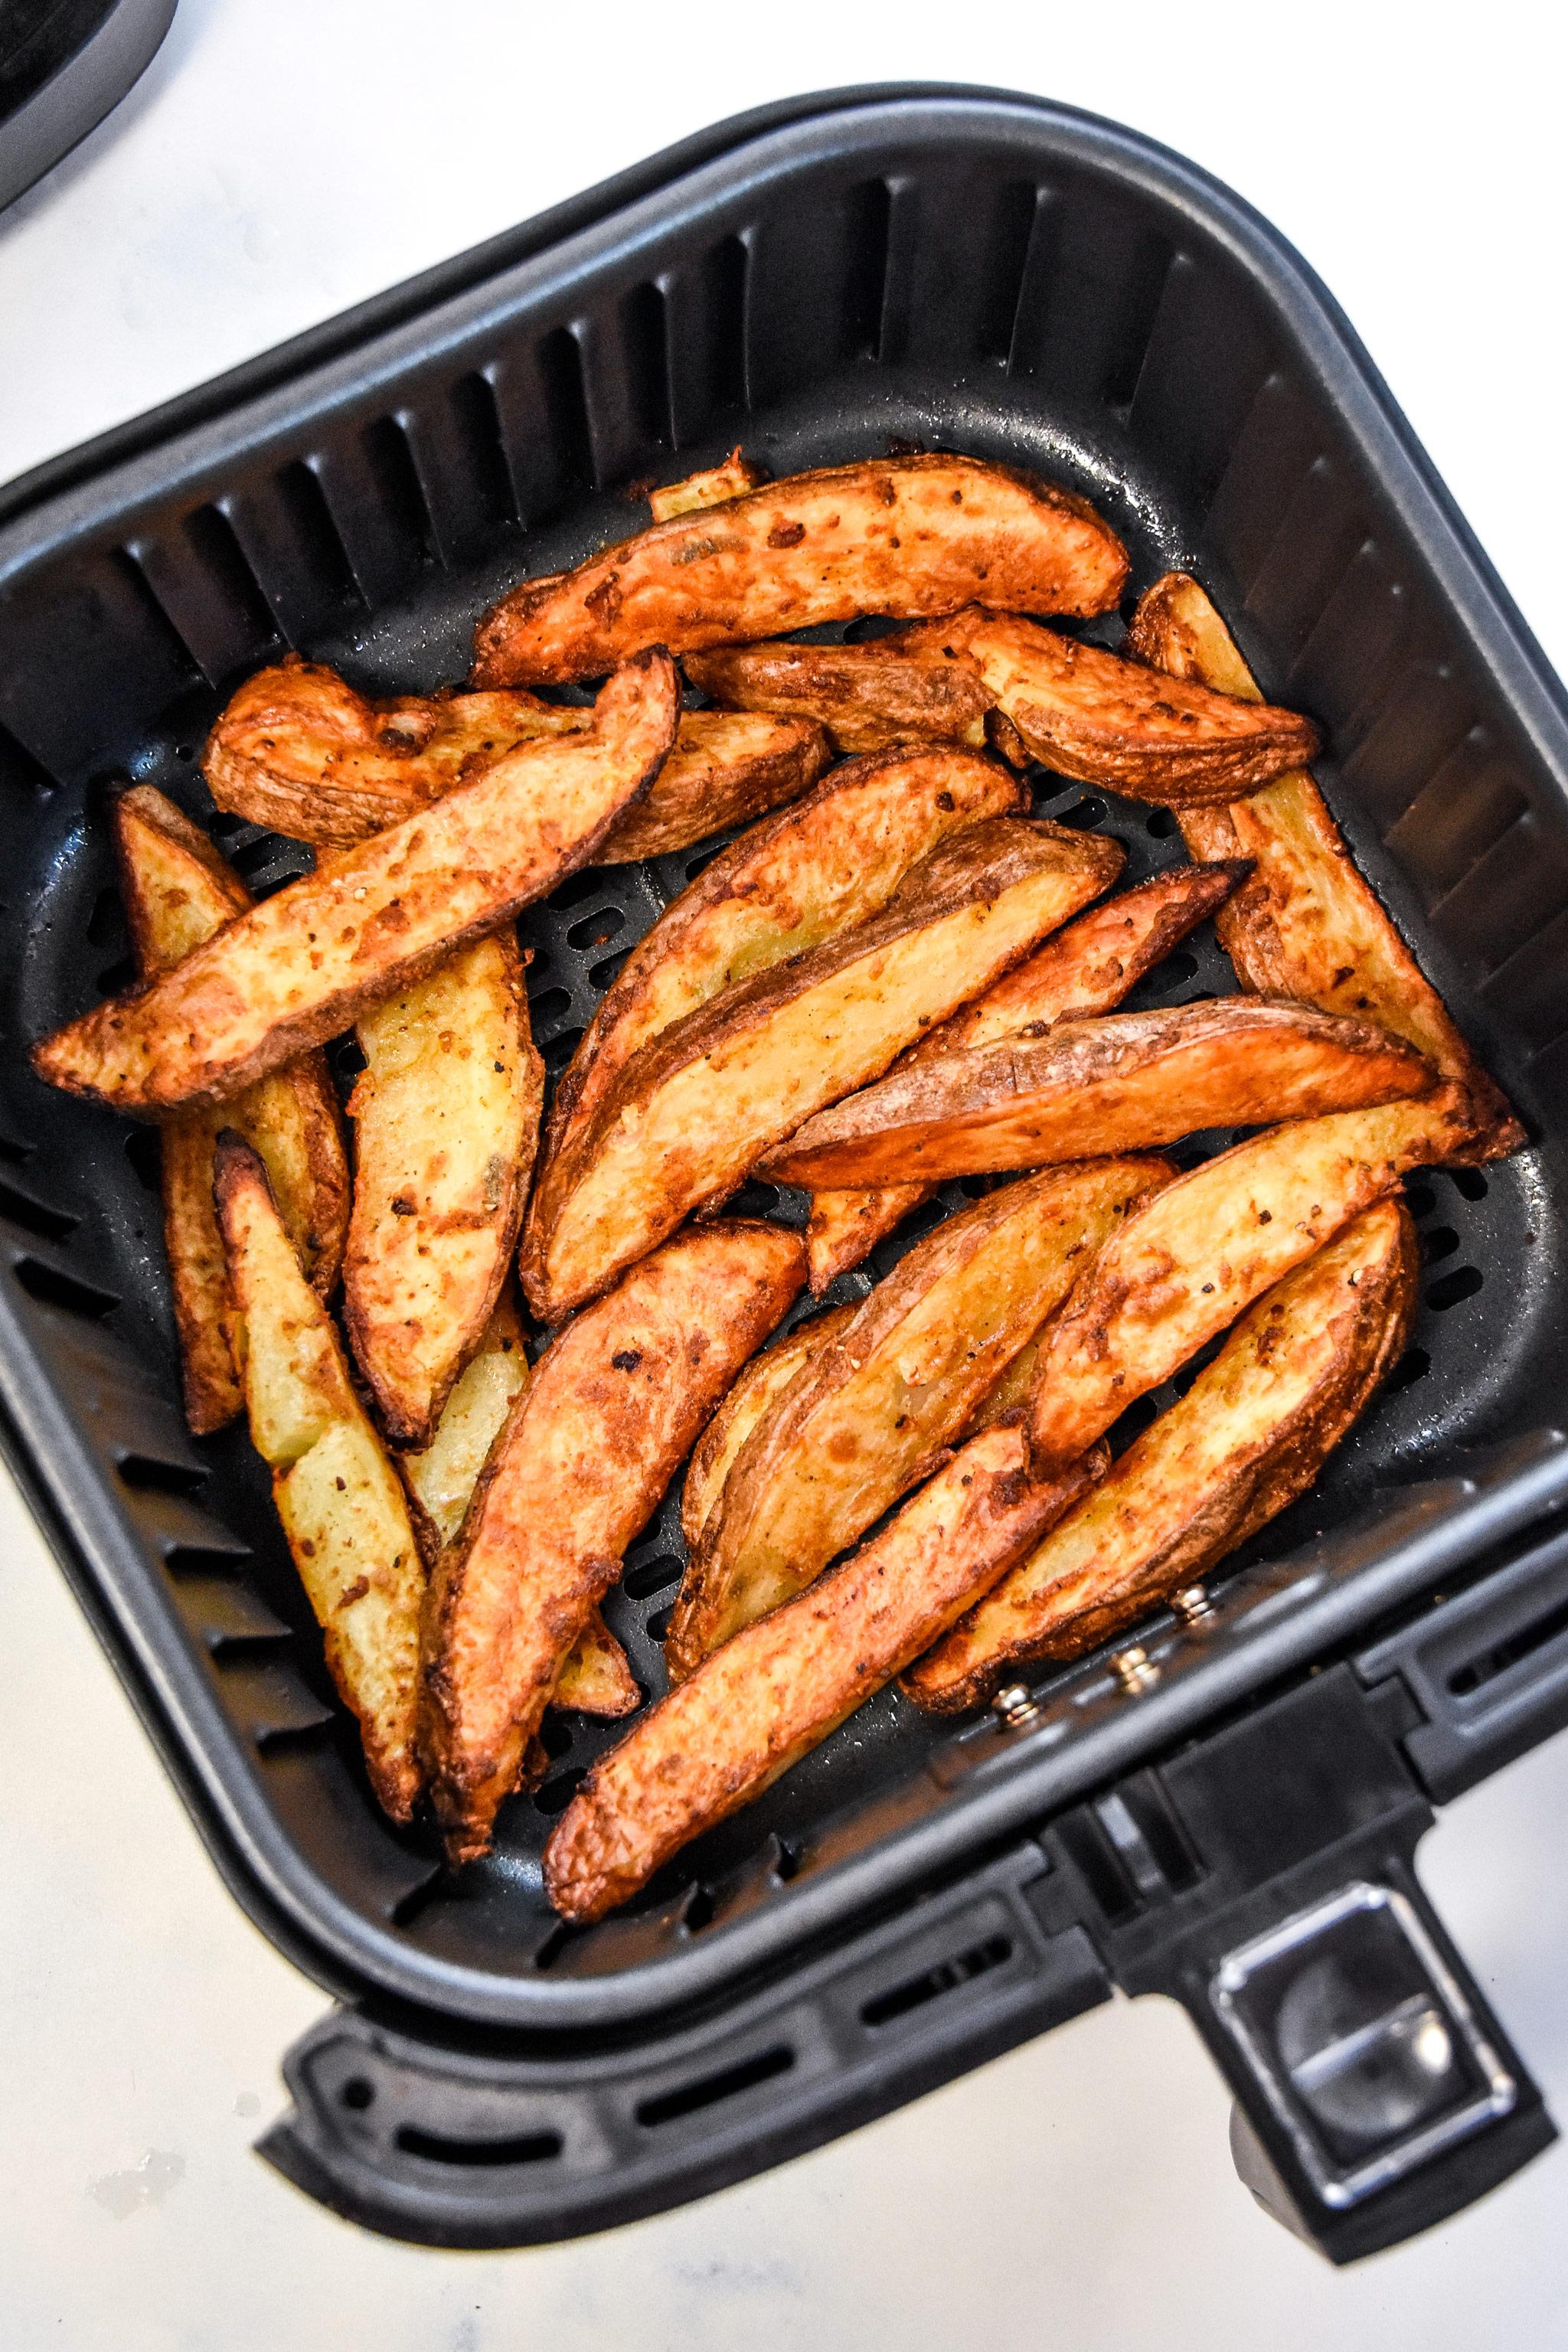 air fryer jojo potato wedges cooked in the air fryer basket.